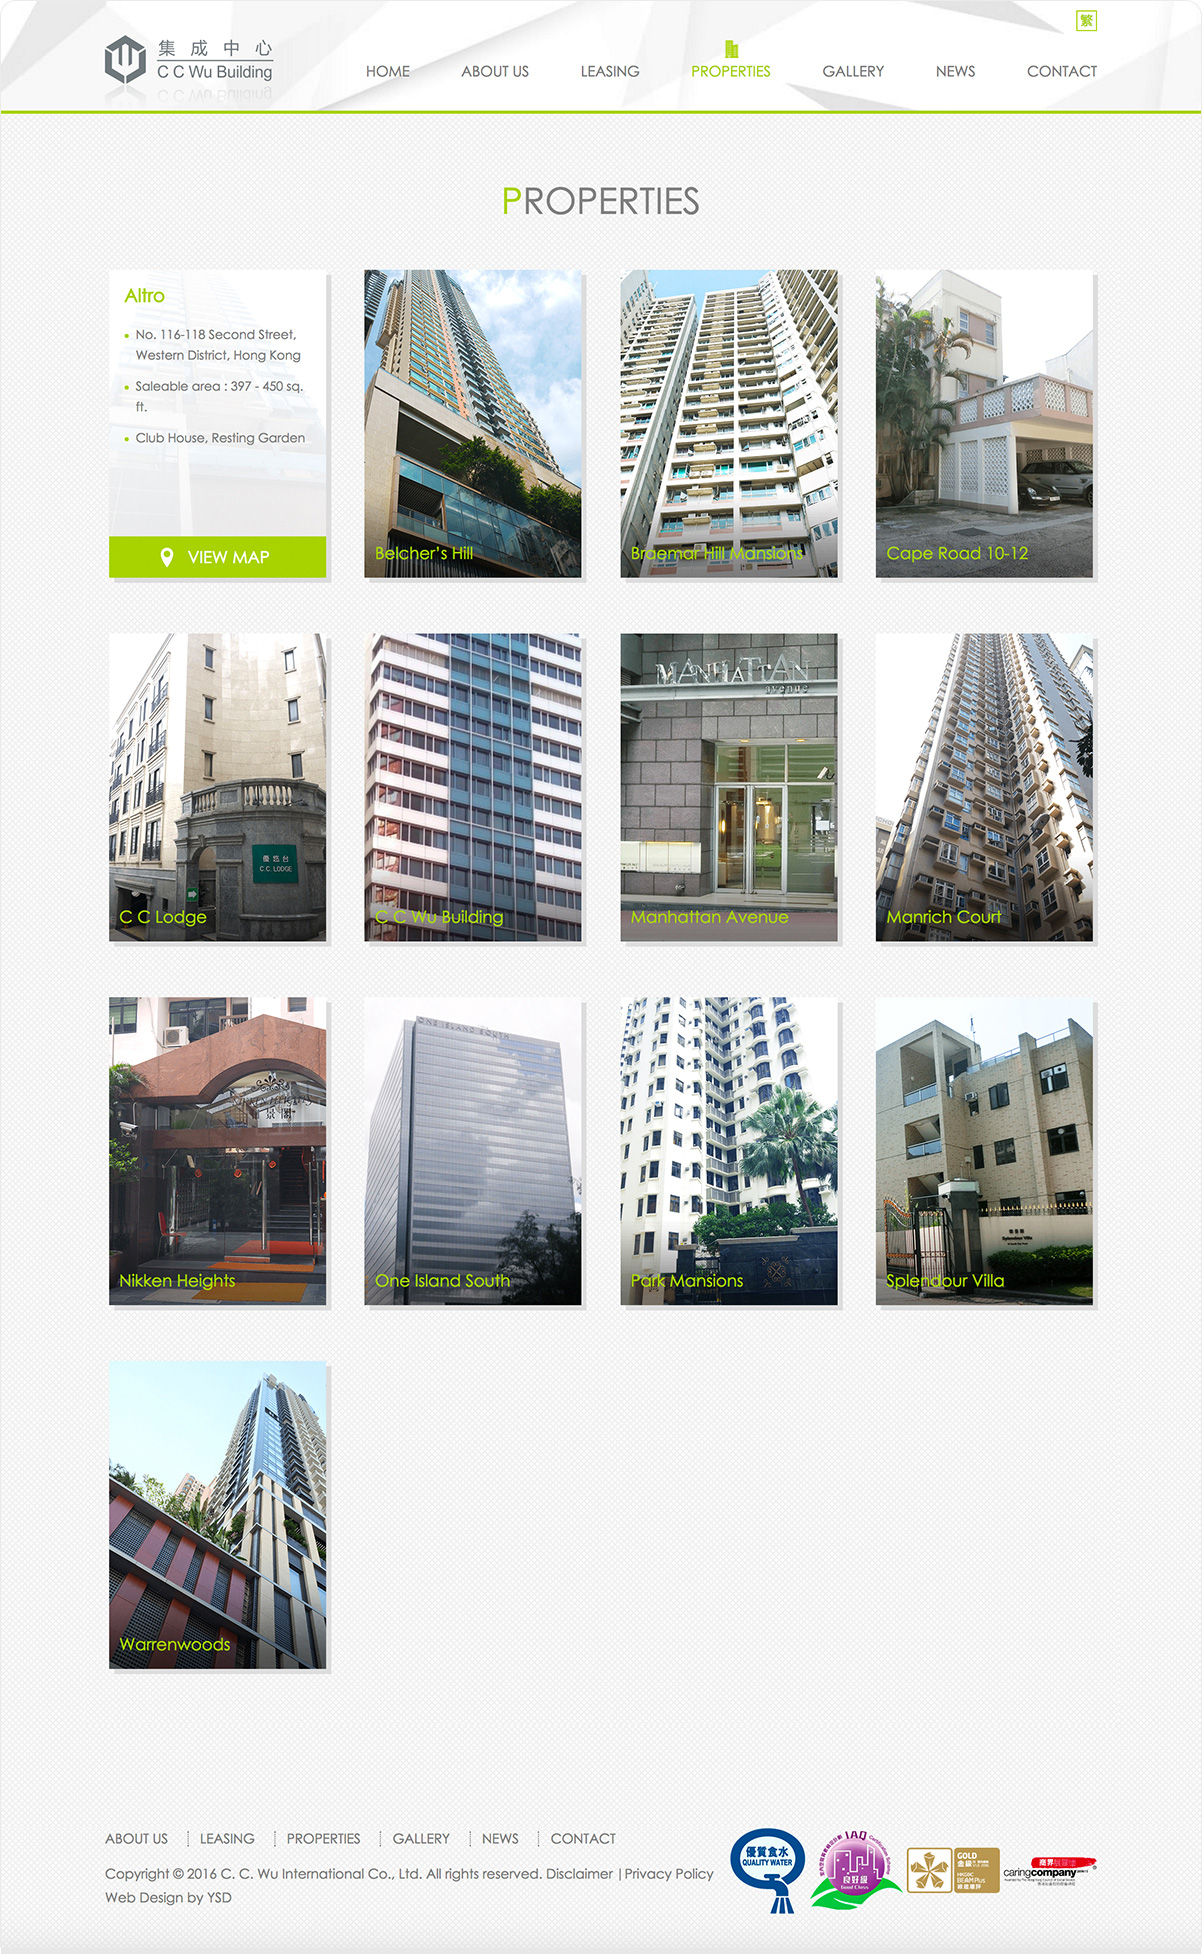 C. C. Wu International Co., Ltd.